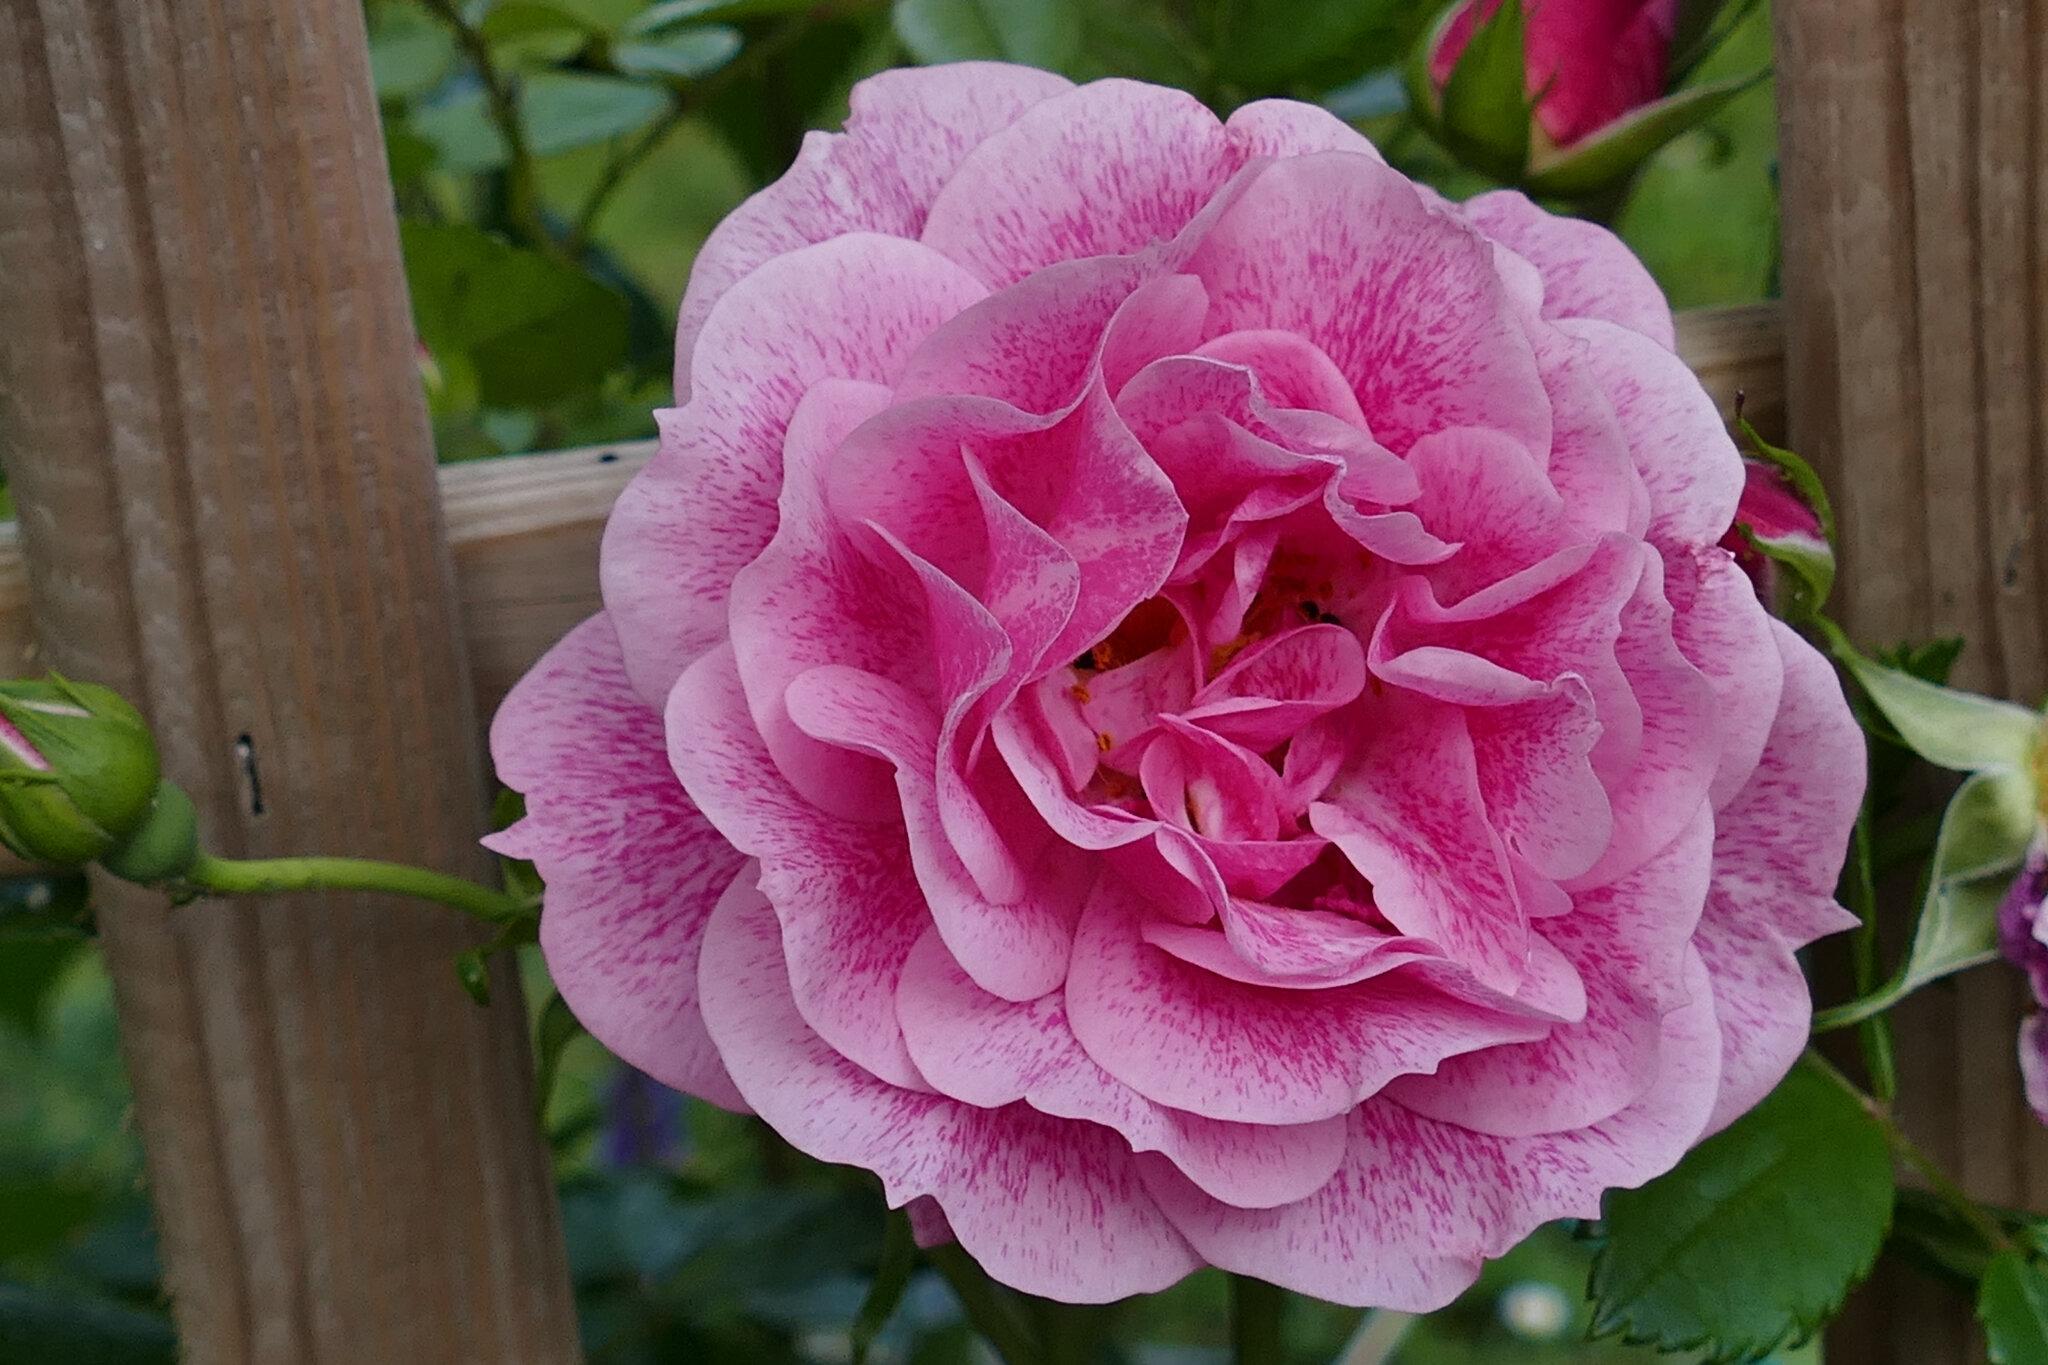 La rose Invictus